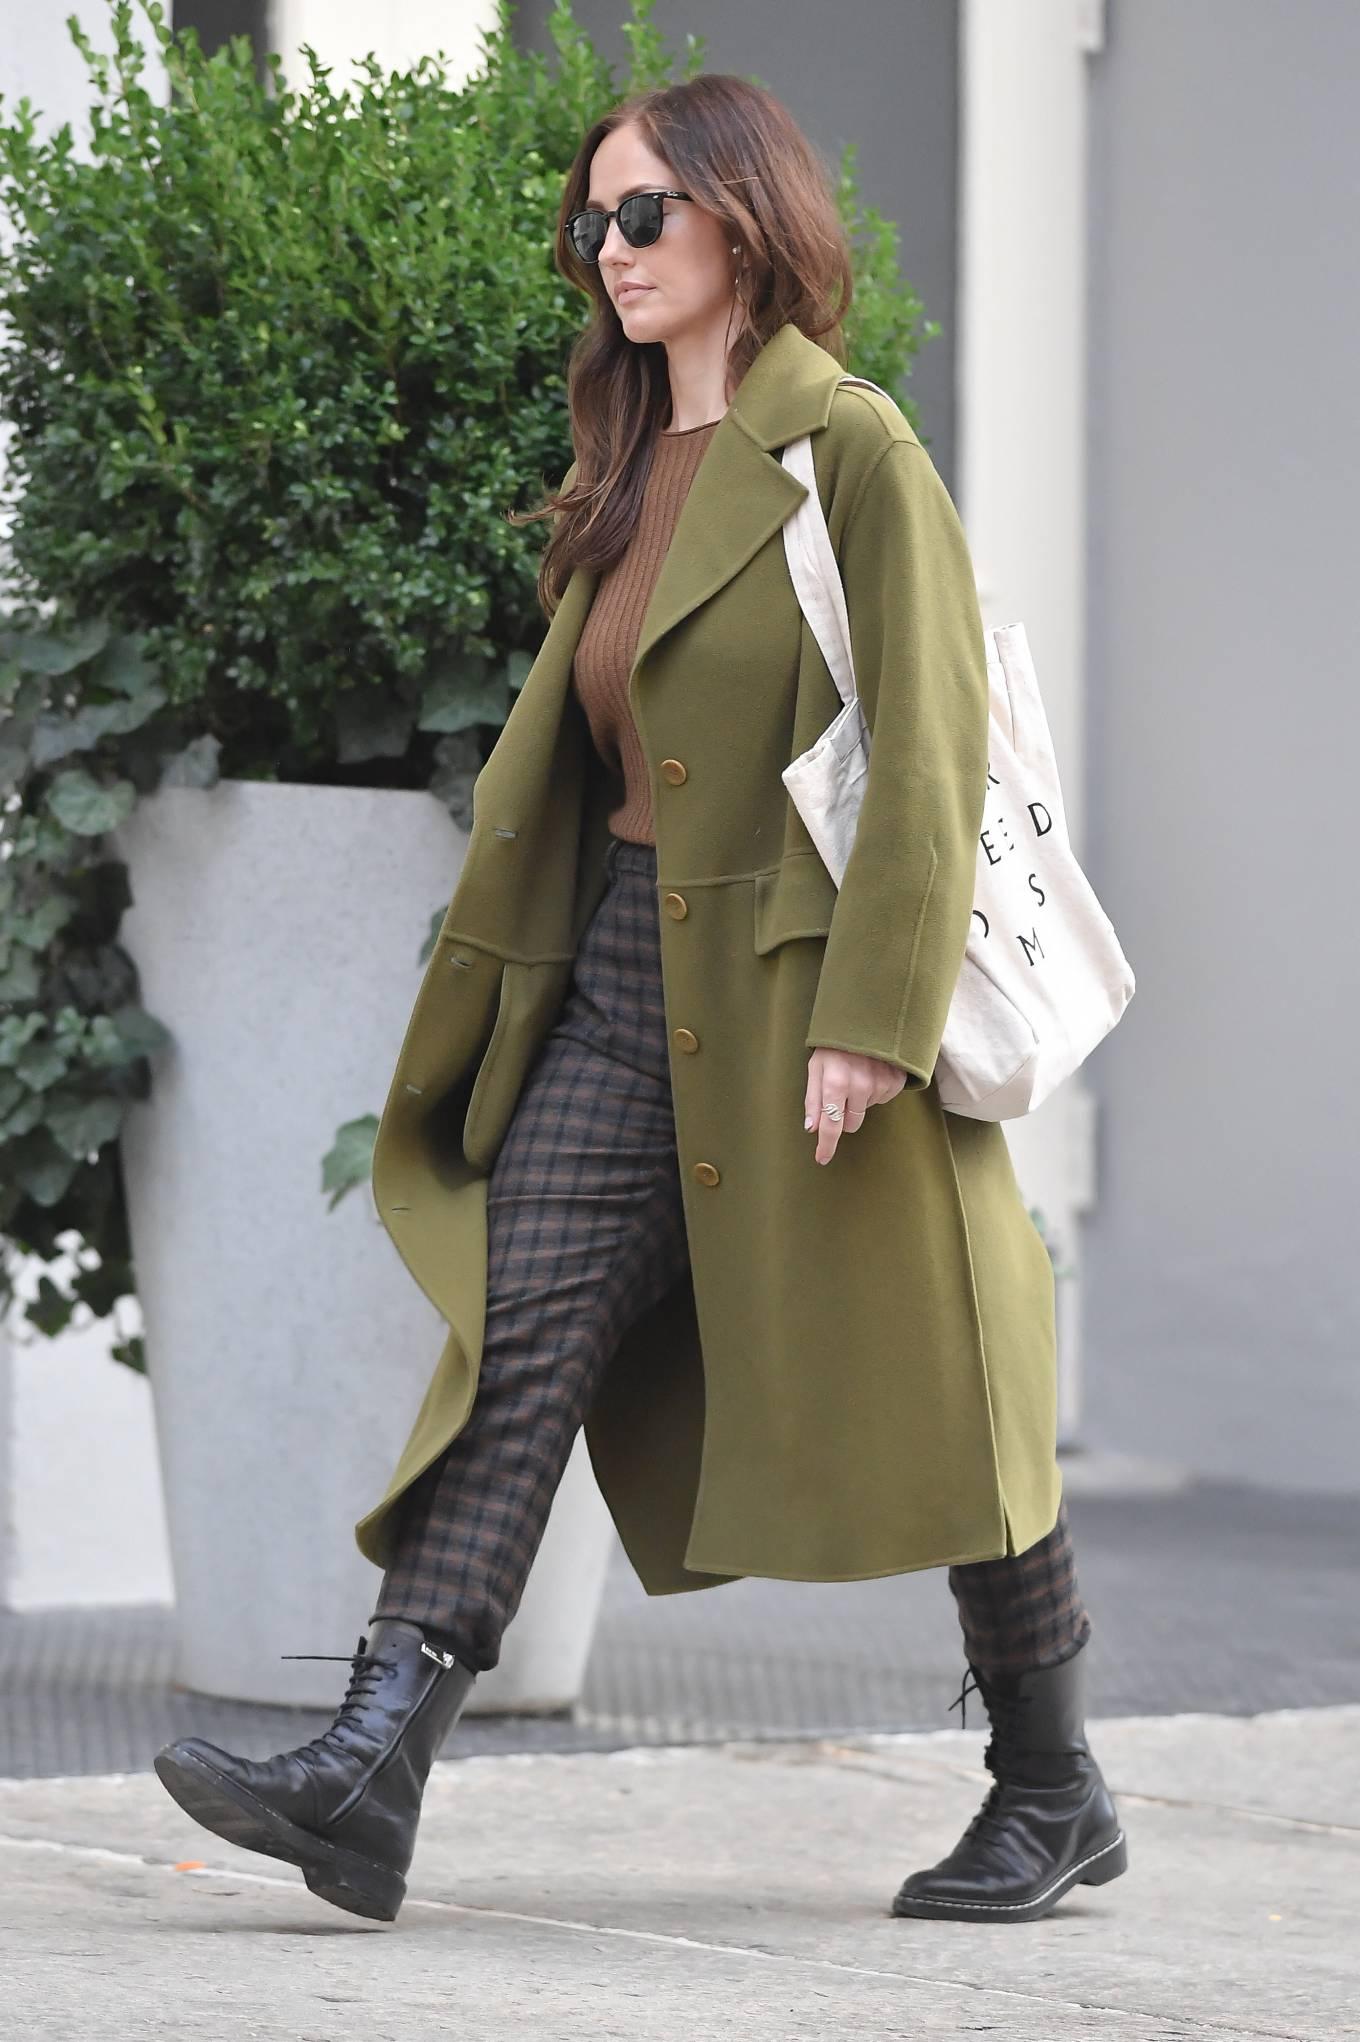 Minka Kelly 2021 : Minka Kelly – In olive green runs errands in New York-17